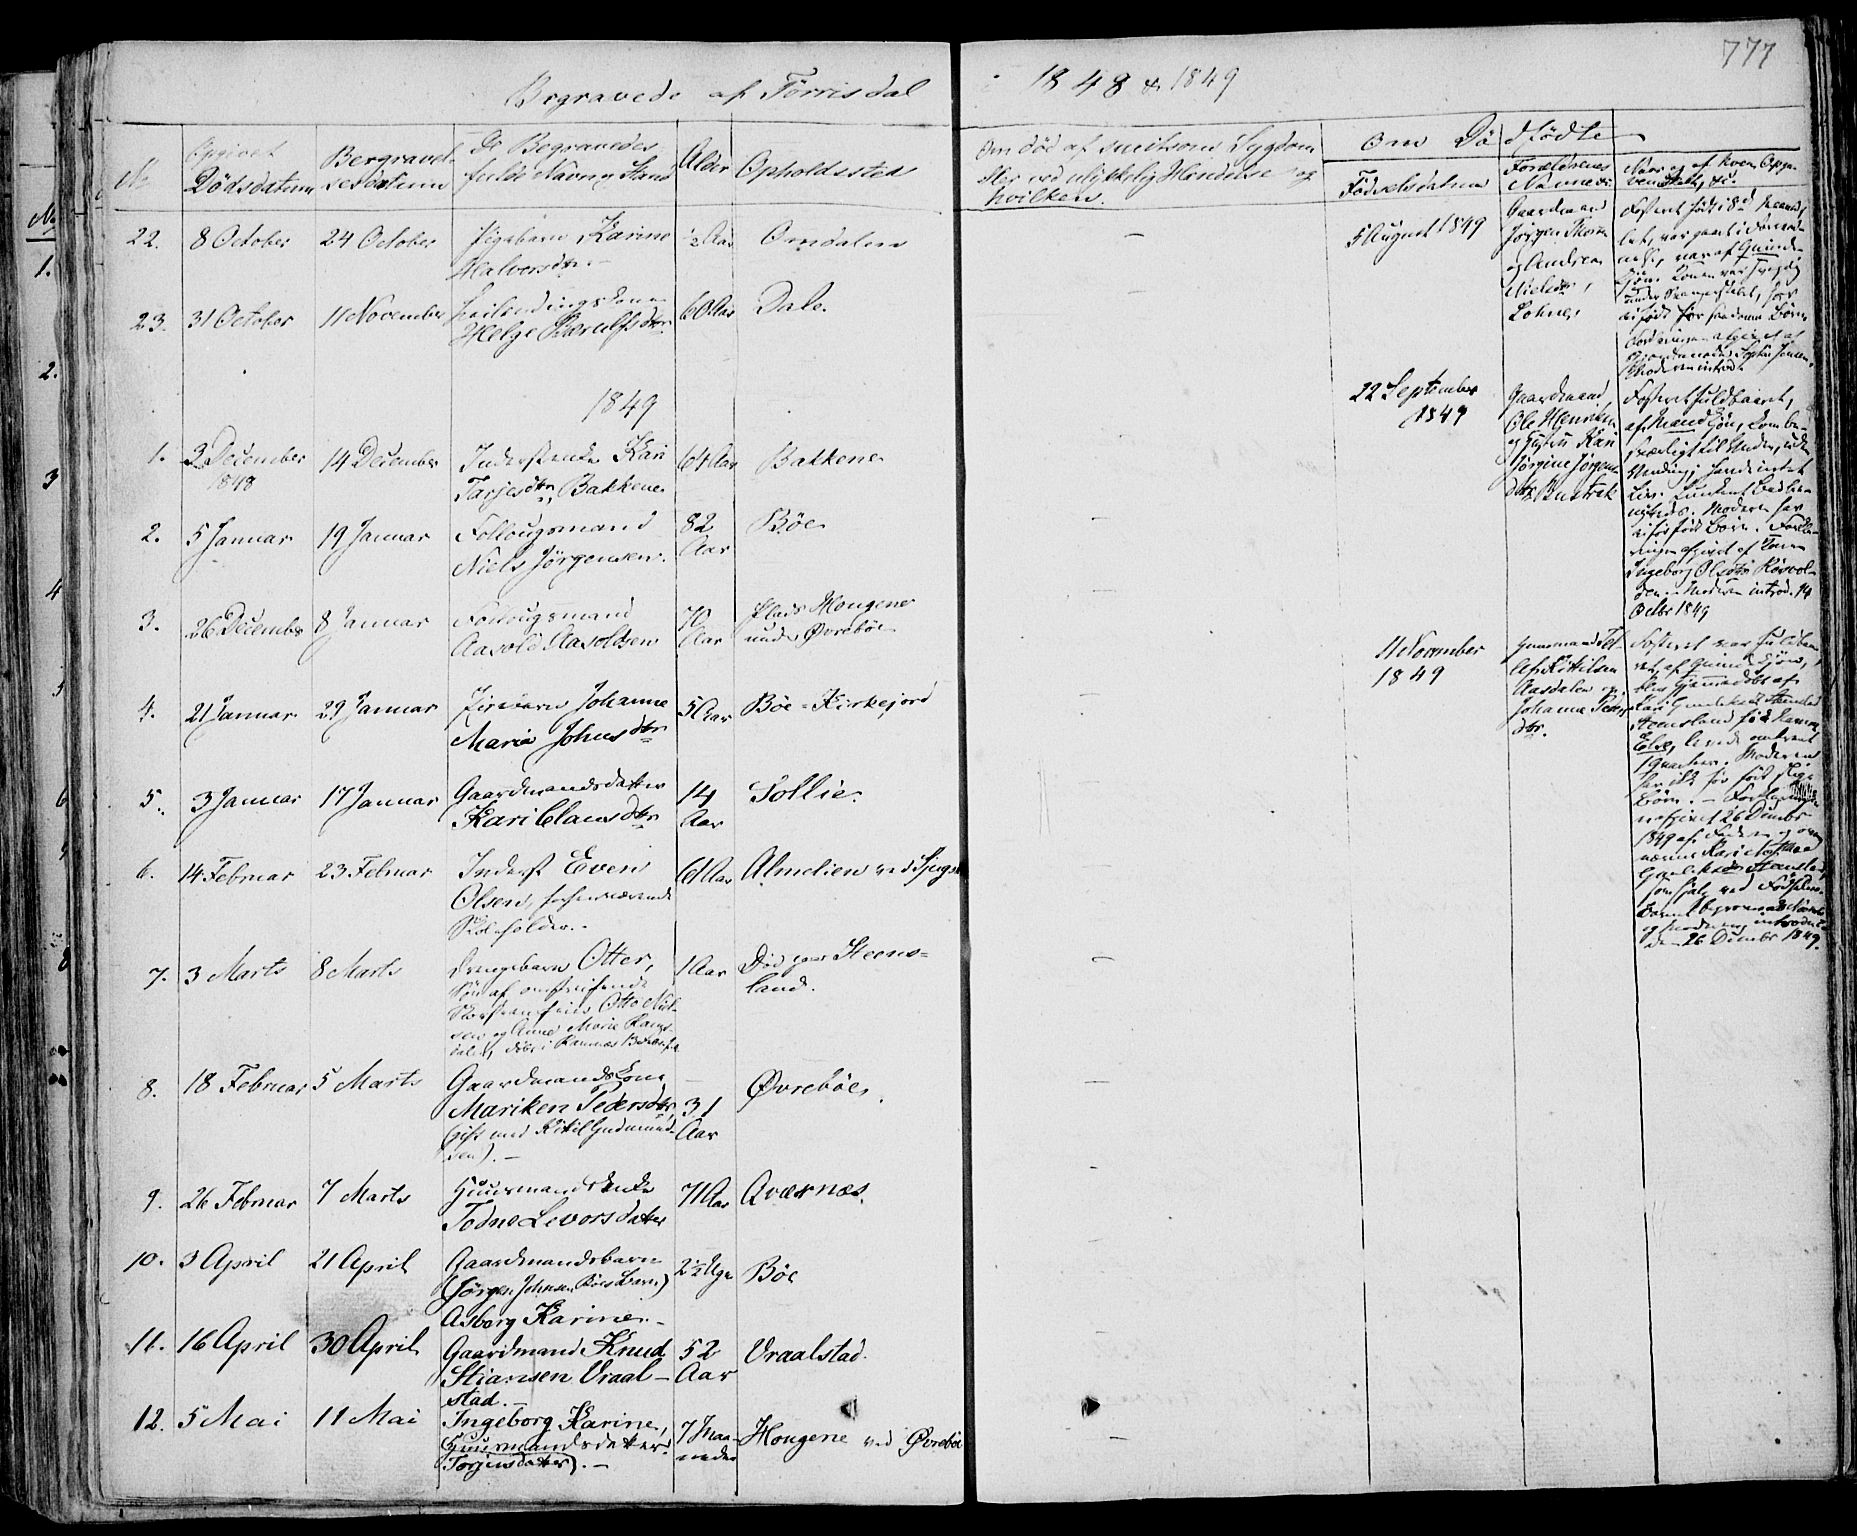 SAKO, Drangedal kirkebøker, F/Fa/L0007b: Ministerialbok nr. 7b, 1837-1856, s. 777